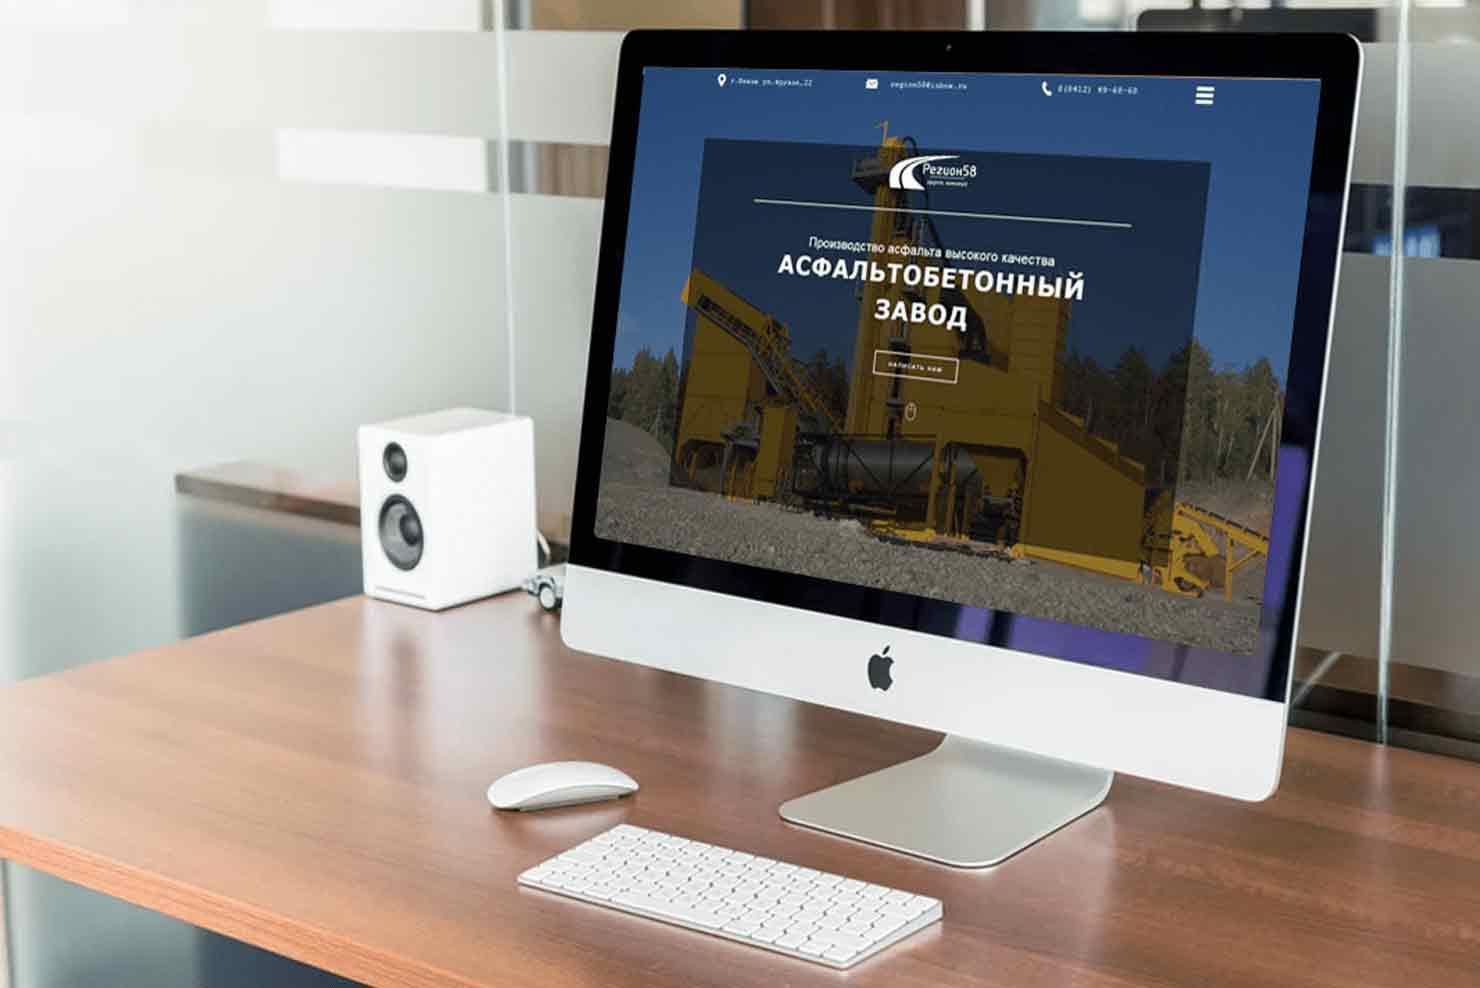 Сайт компании Регион 58